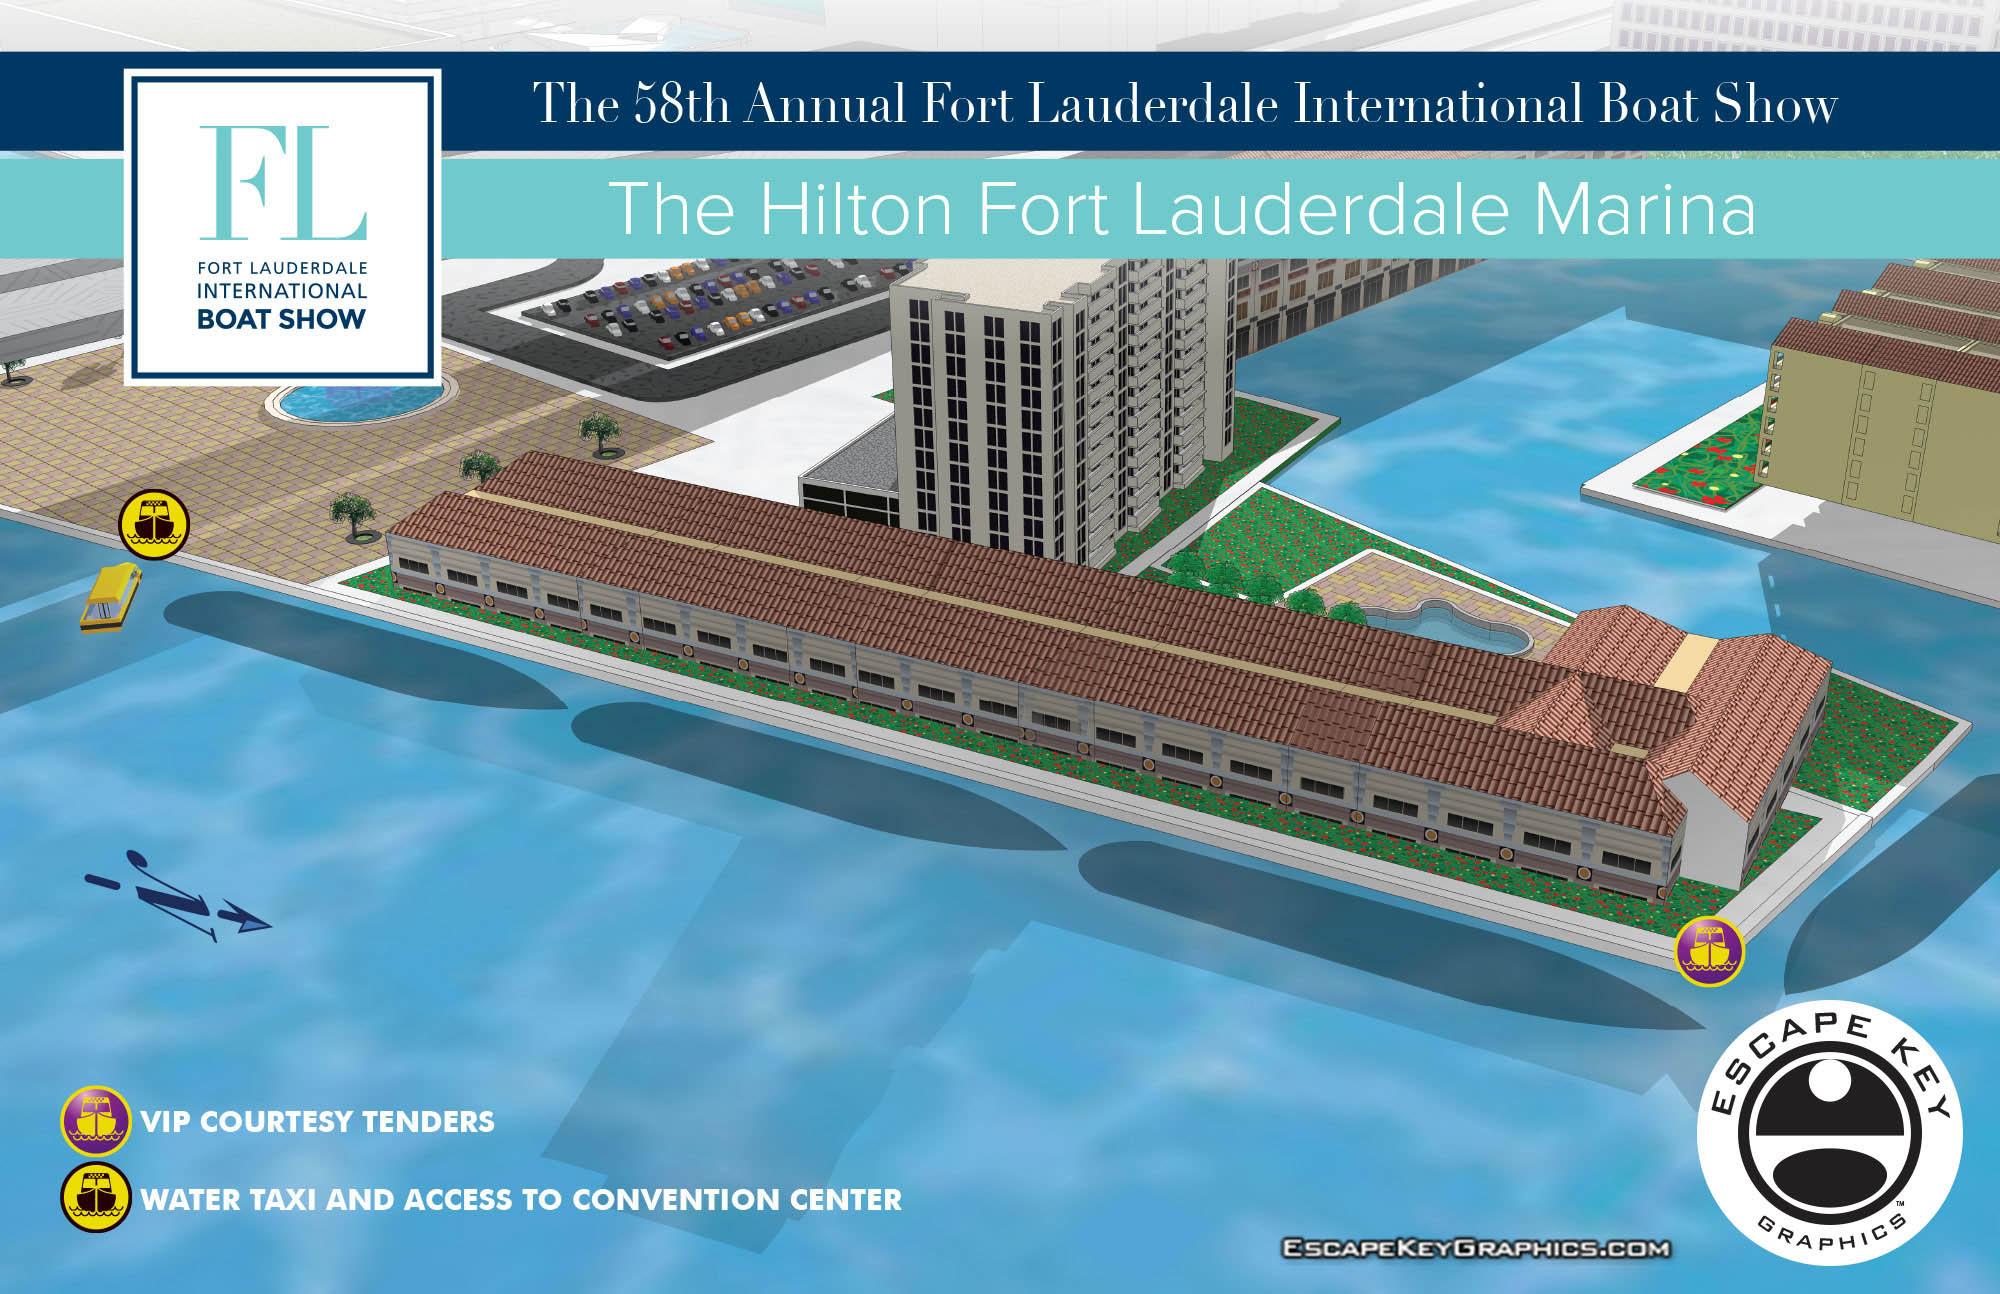 Fort Lauderdale International Boat Show map